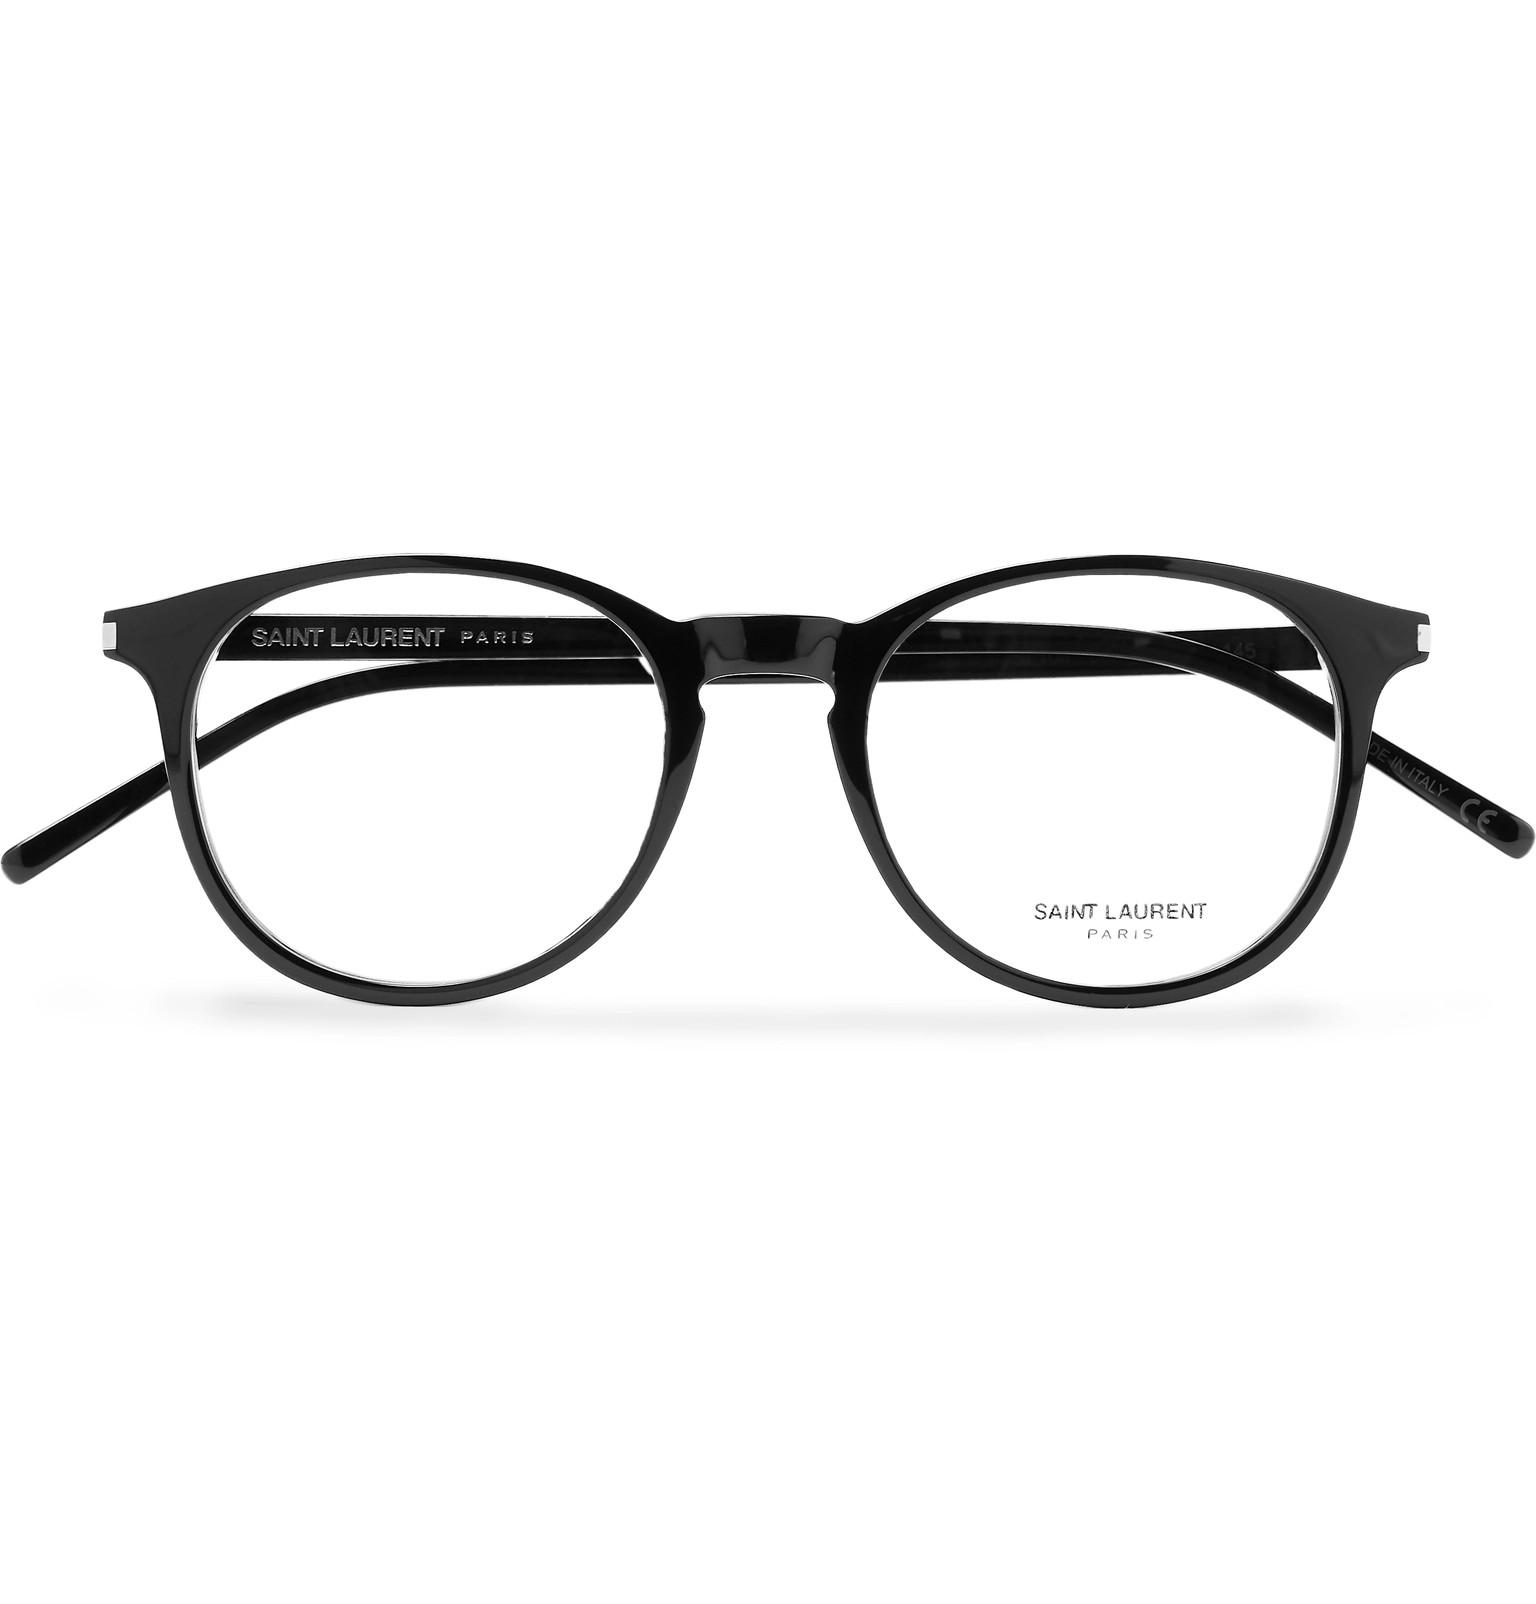 c37411e55a5f Saint Laurent - Black Round-frame Acetate Optical Glasses for Men - Lyst.  View fullscreen